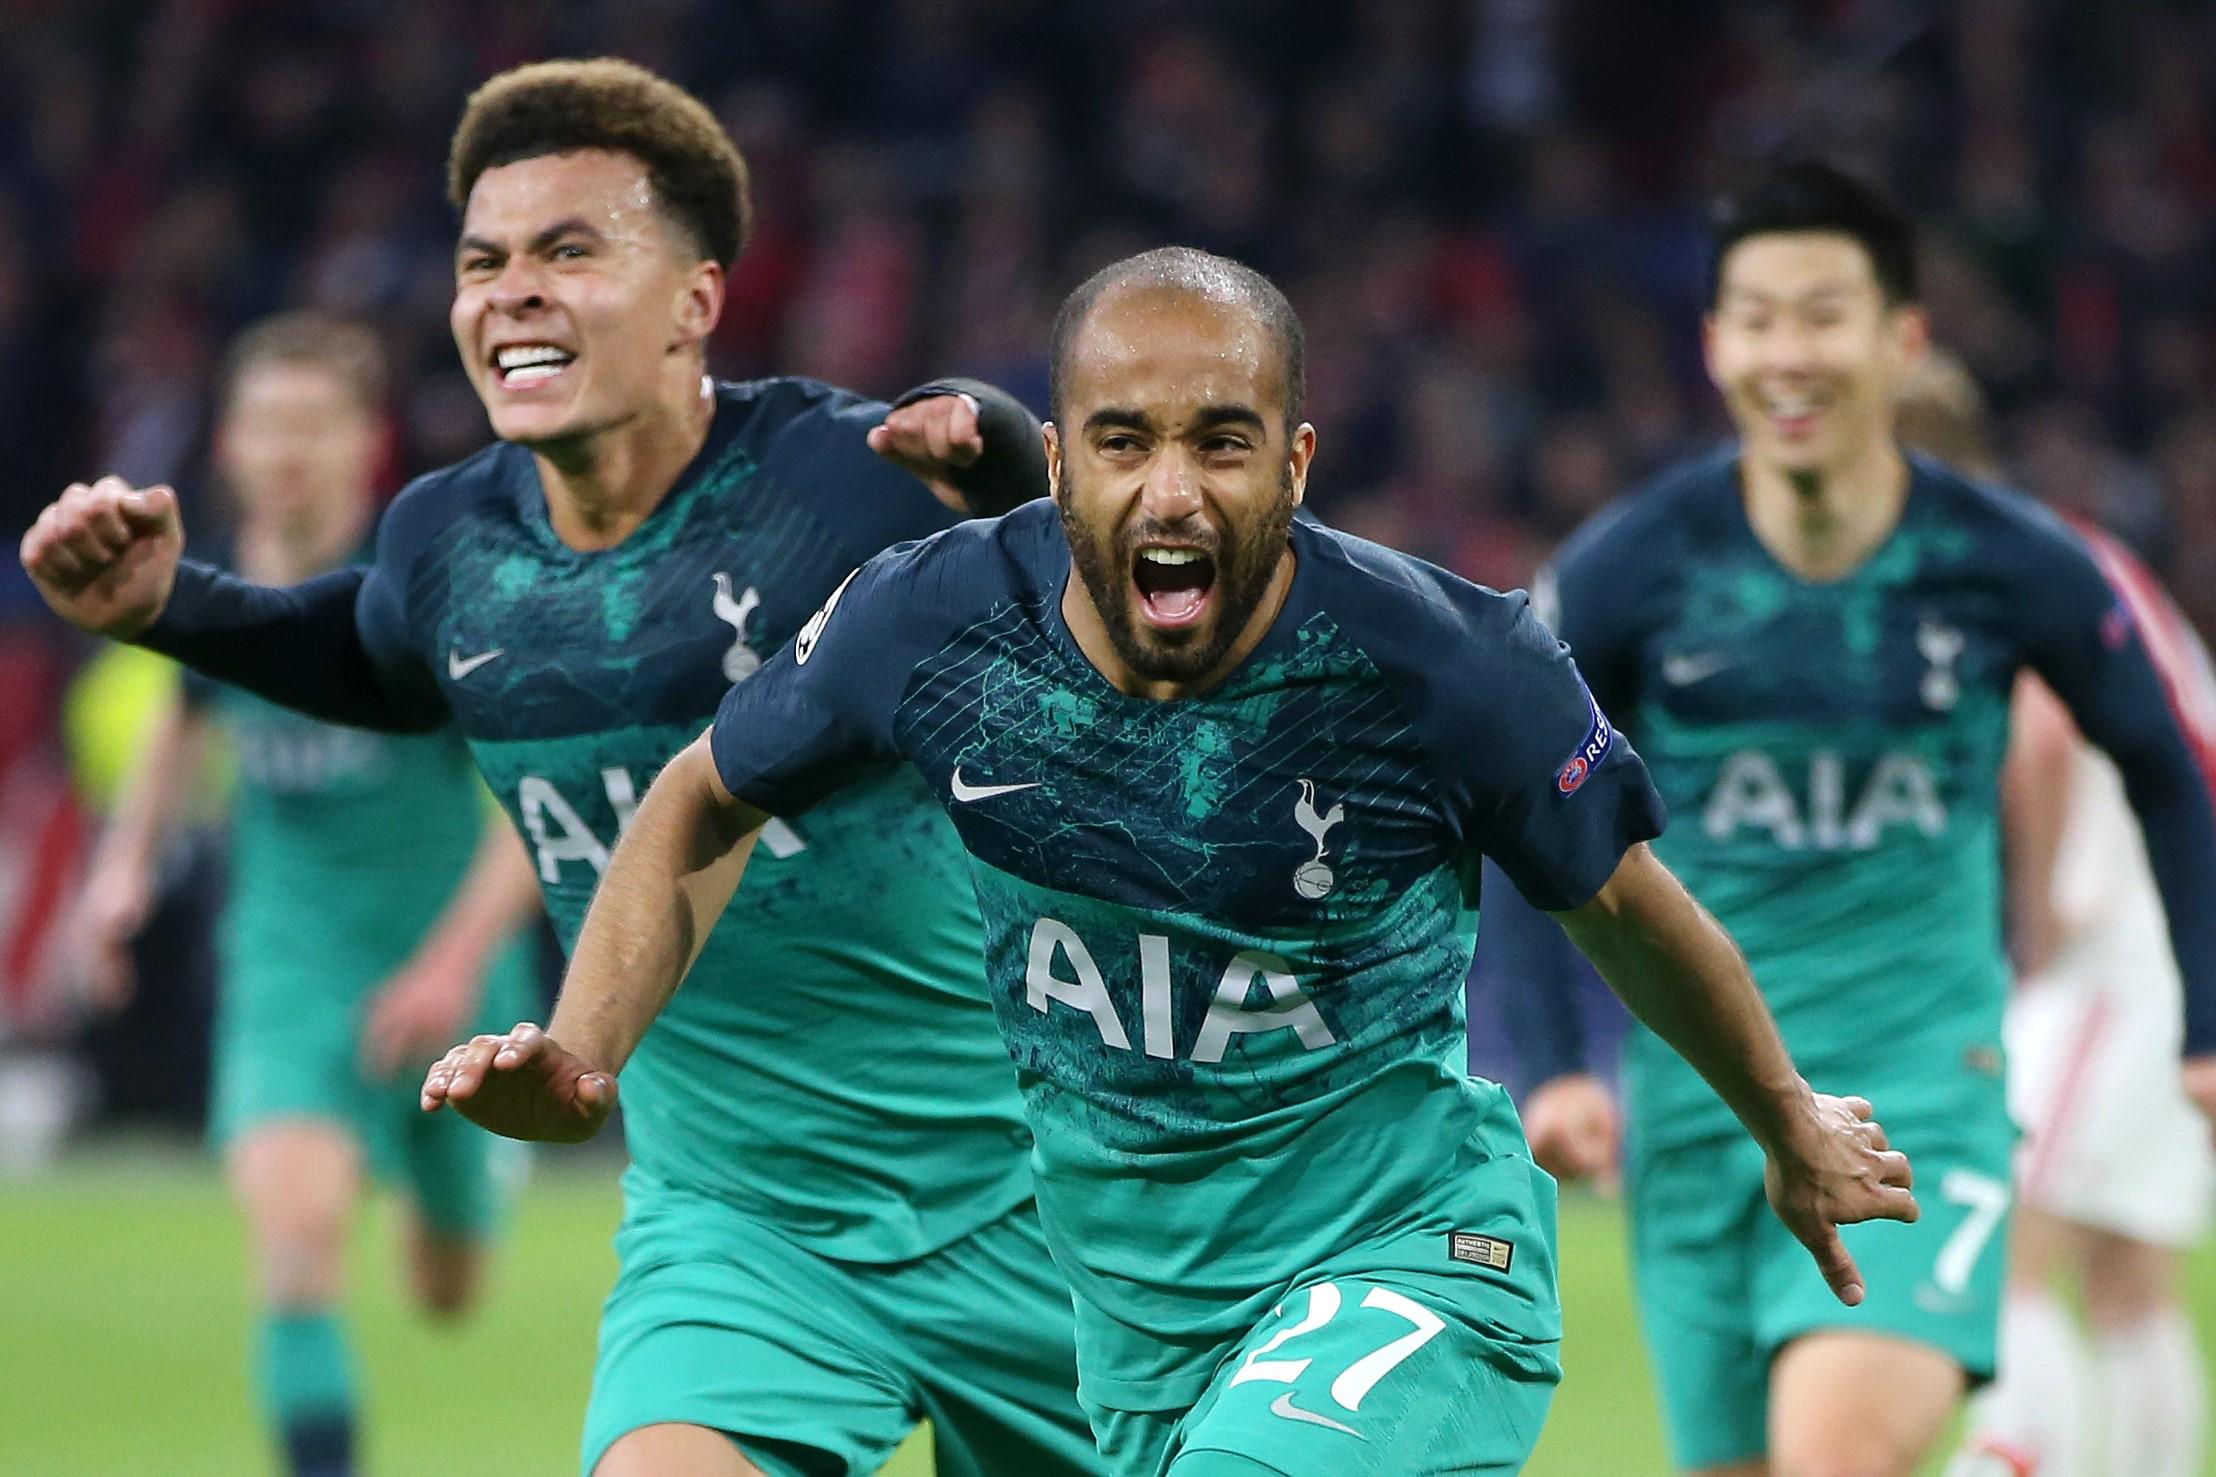 Tottenham HotspurLucas Moura Home Jersey